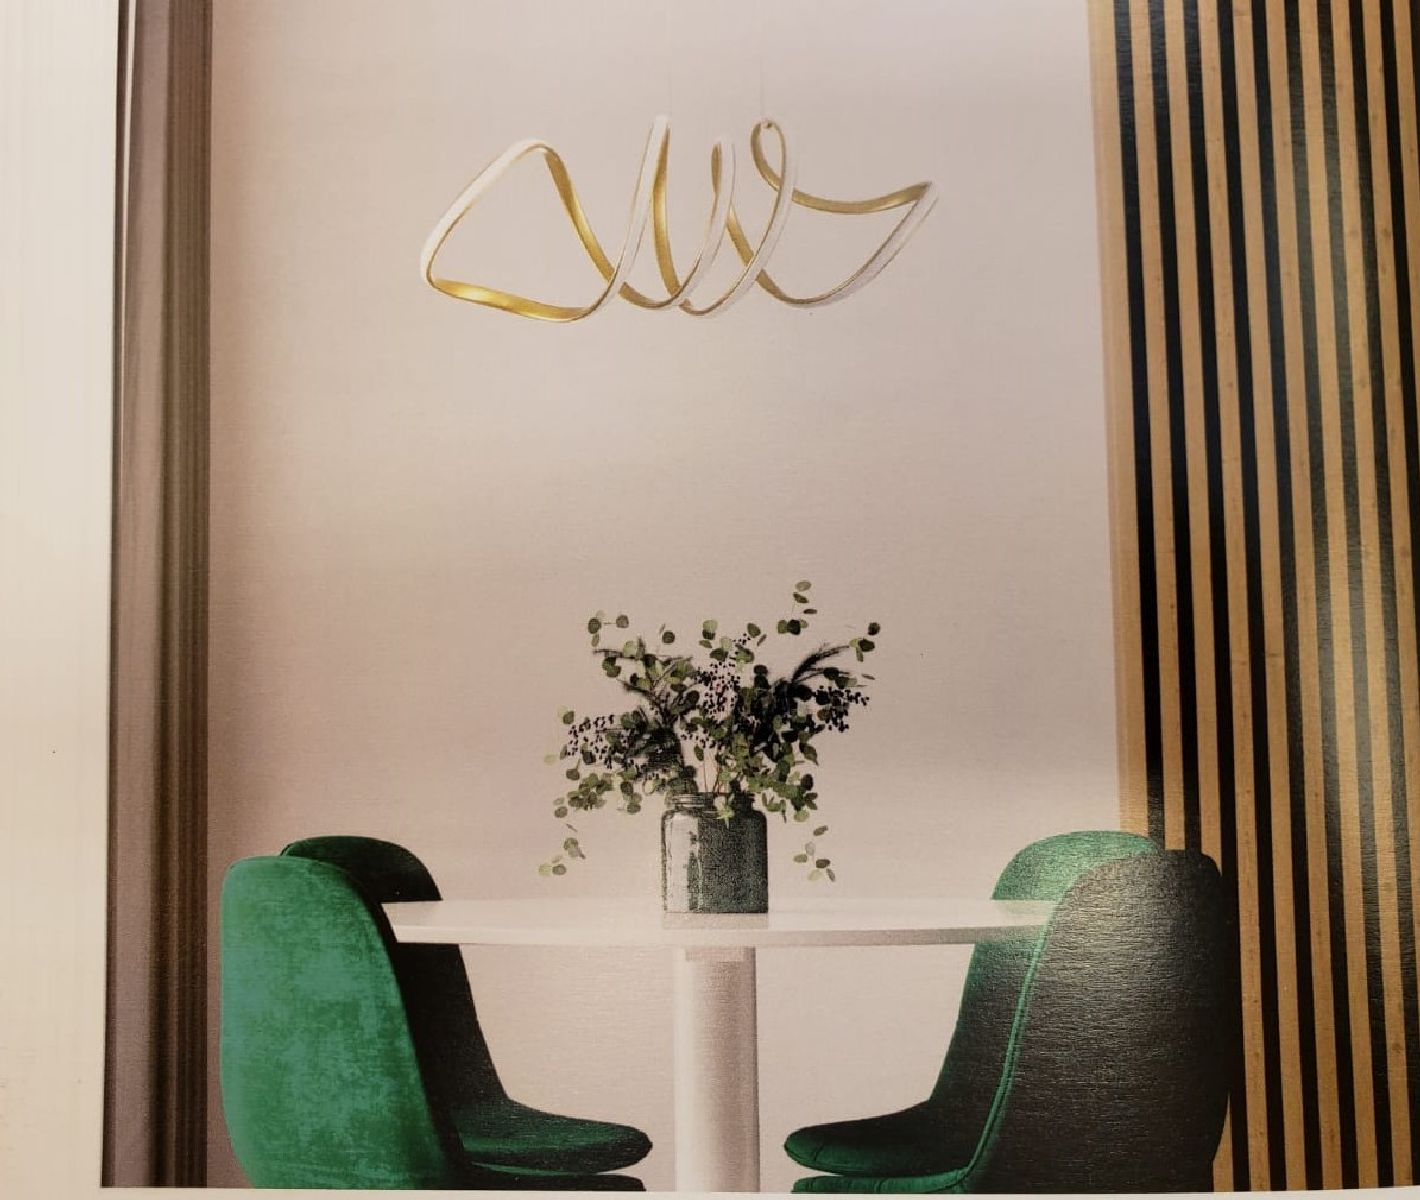 Pendente Led Dourado P/ Mesa Gourmet  Sala De Jantar Quarto